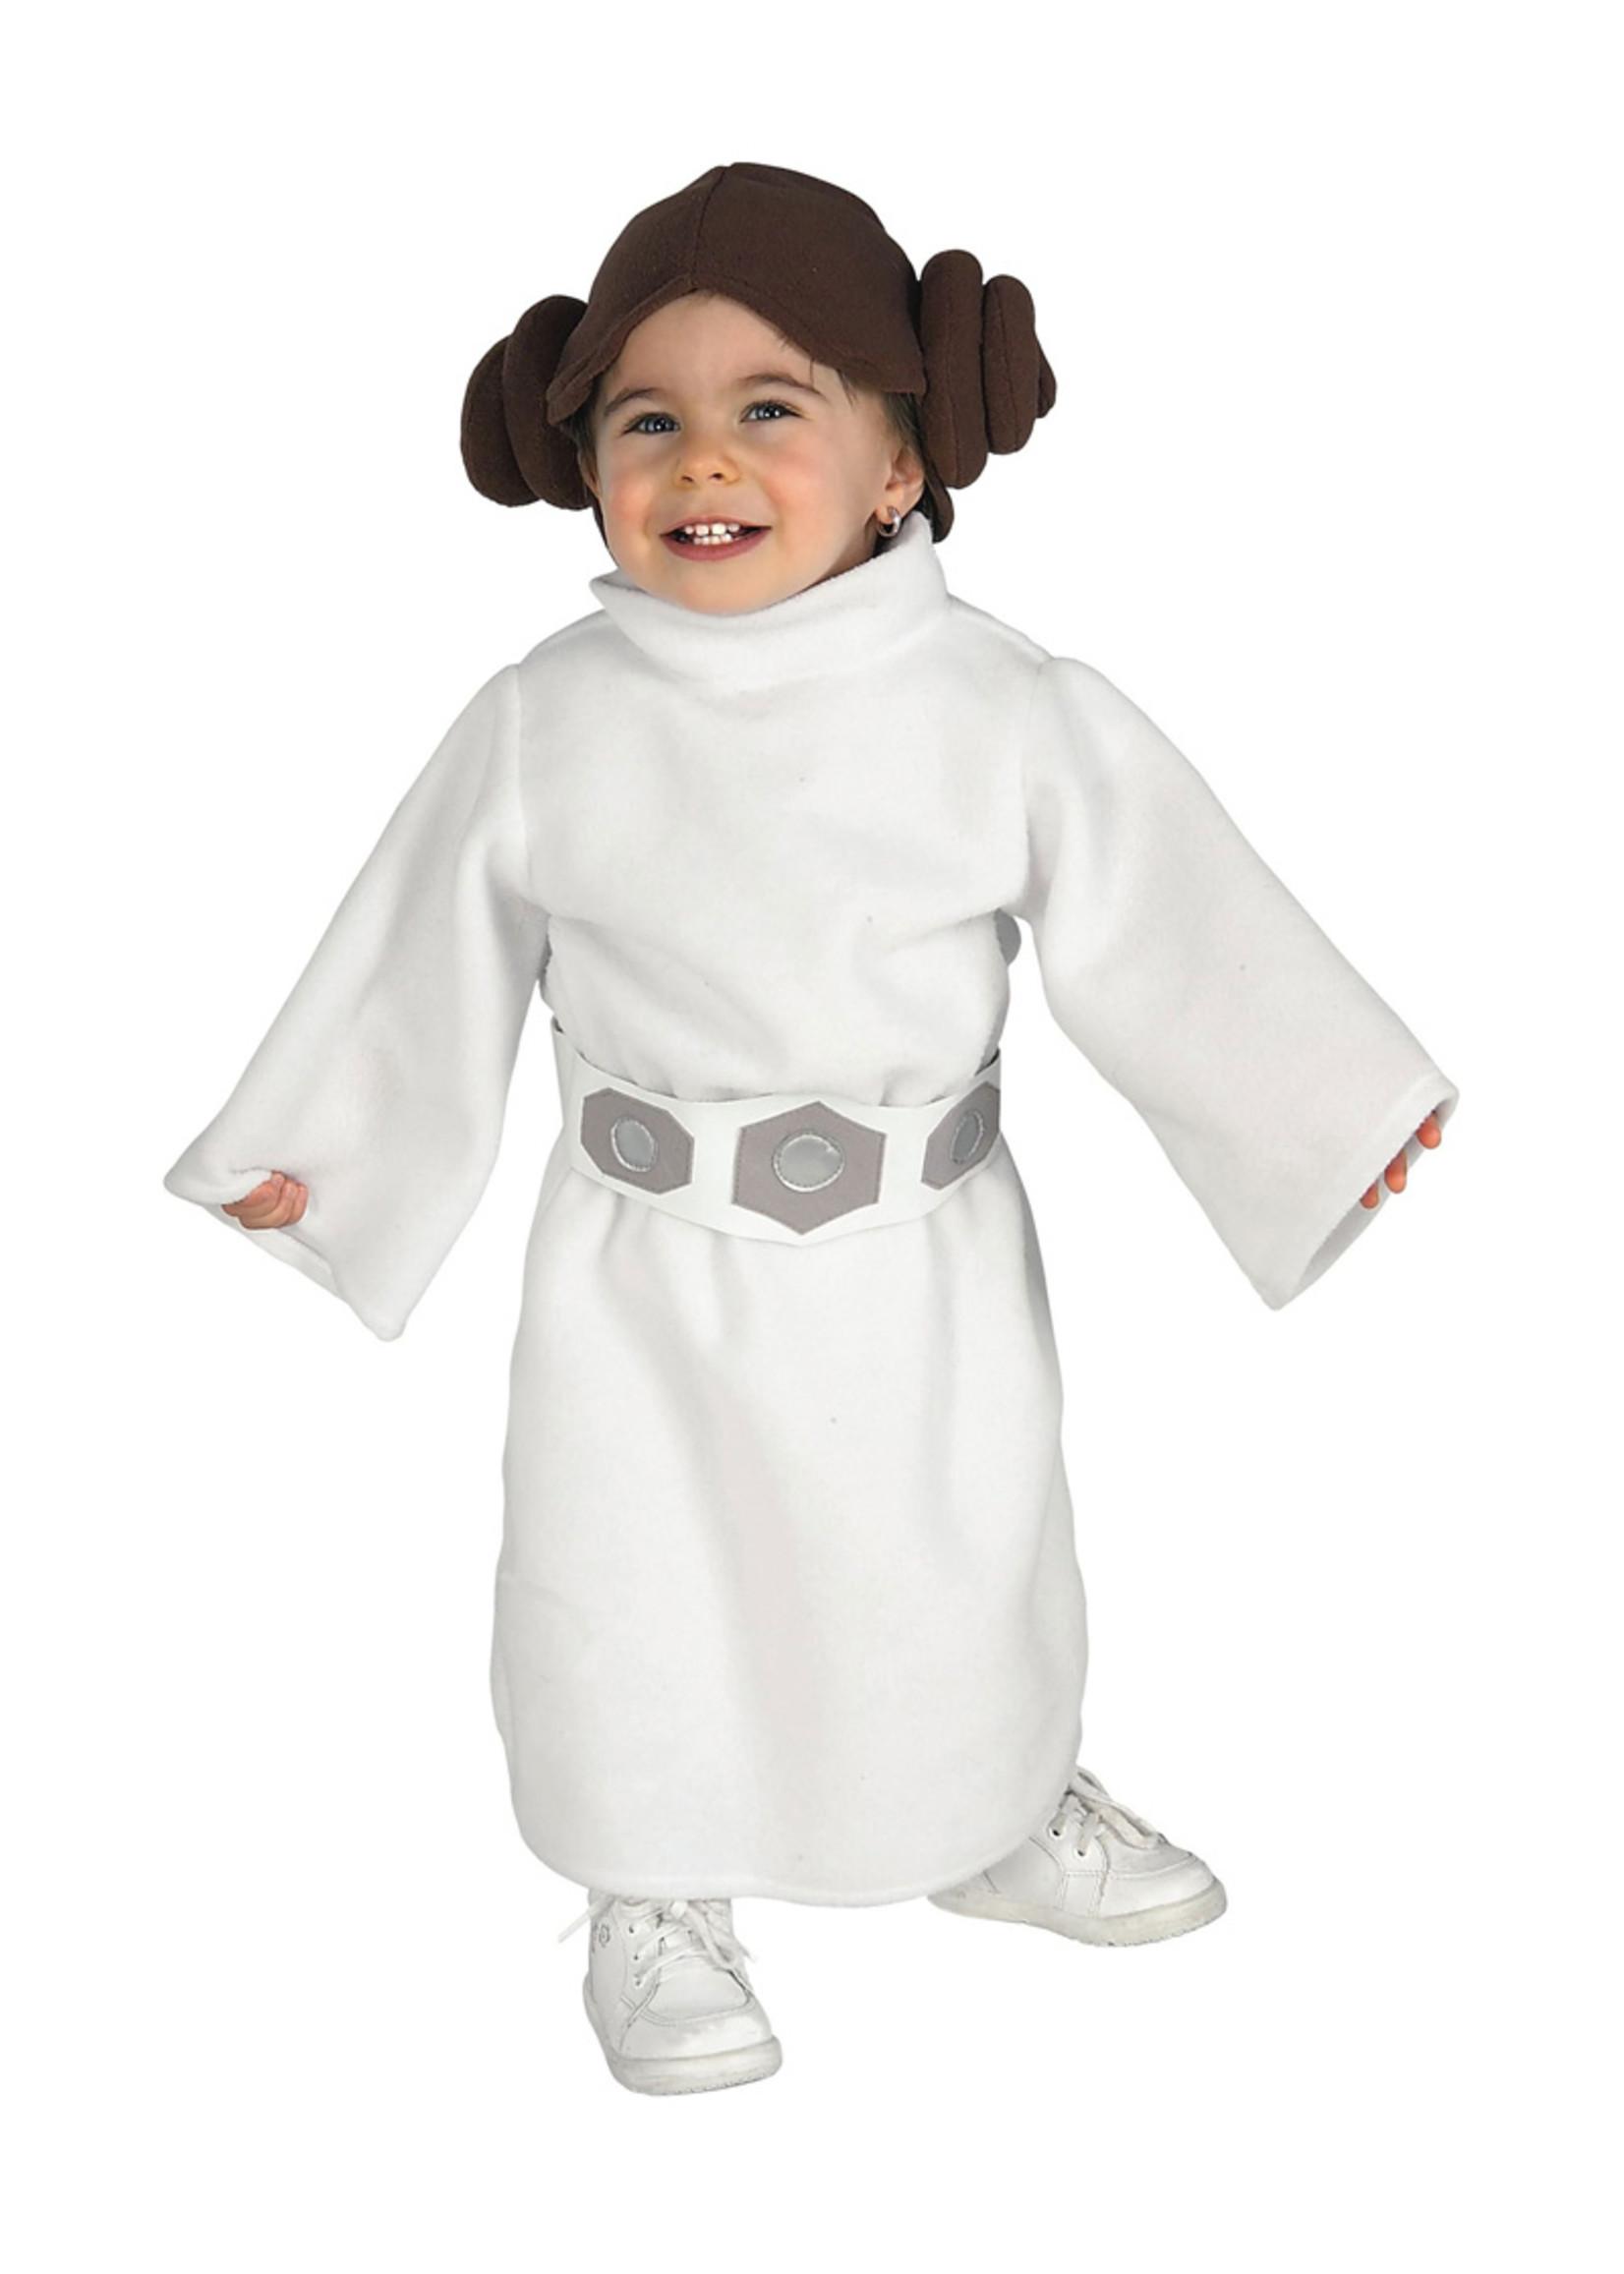 Princess Leia Costume - Toddler